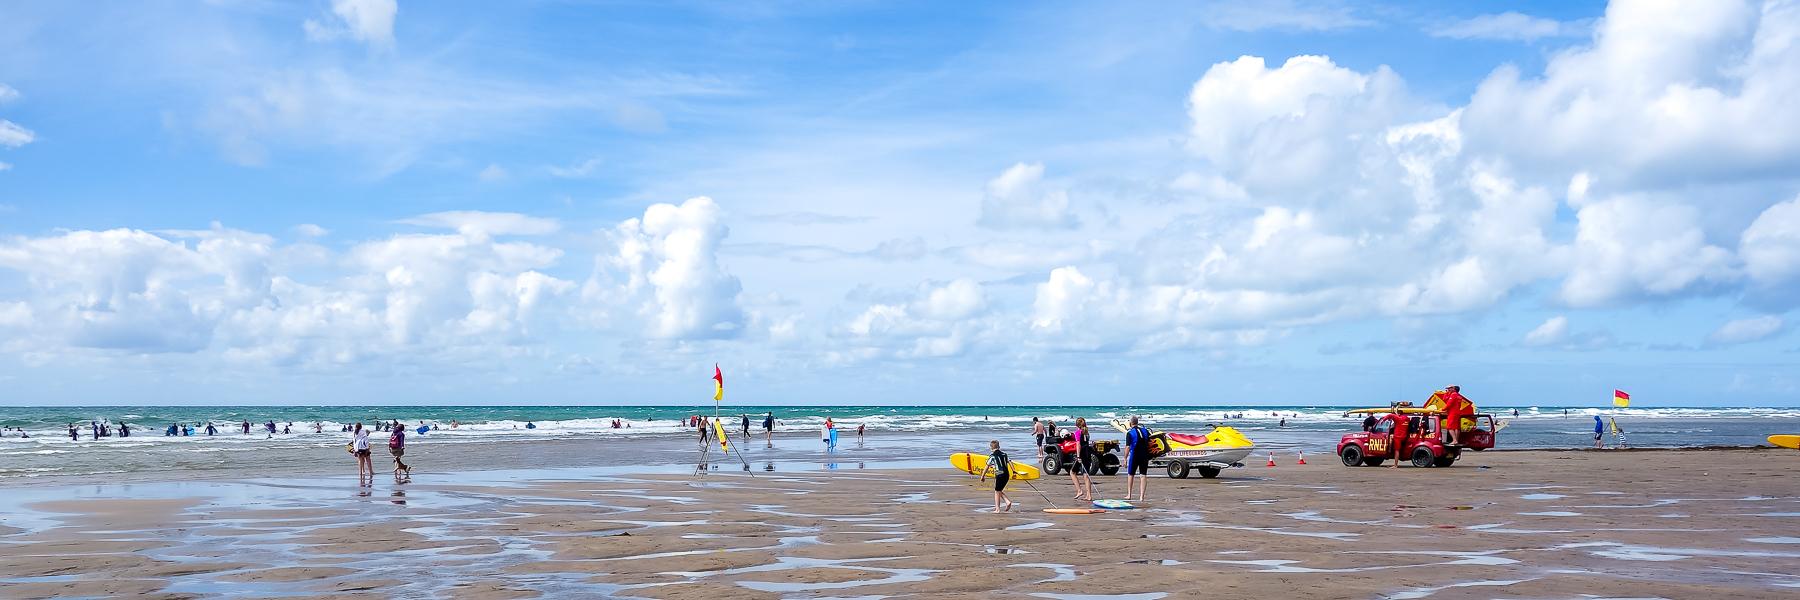 BUDE, CORNWALL/UK - AUGUST 12 : People enjoying the beach at Bud